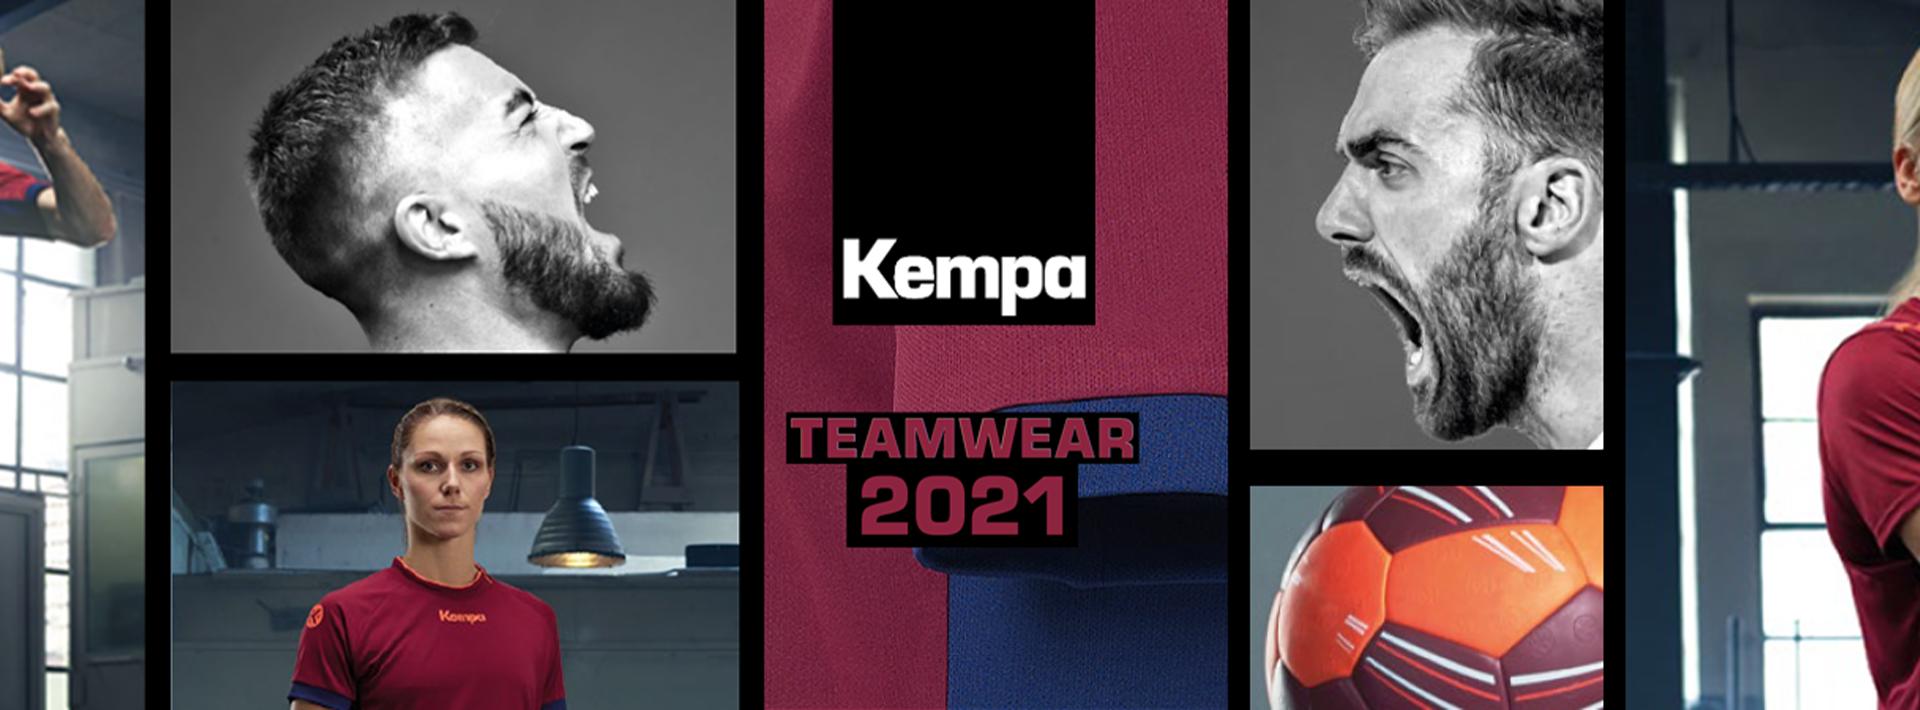 Kempa-Header-1920x710-1